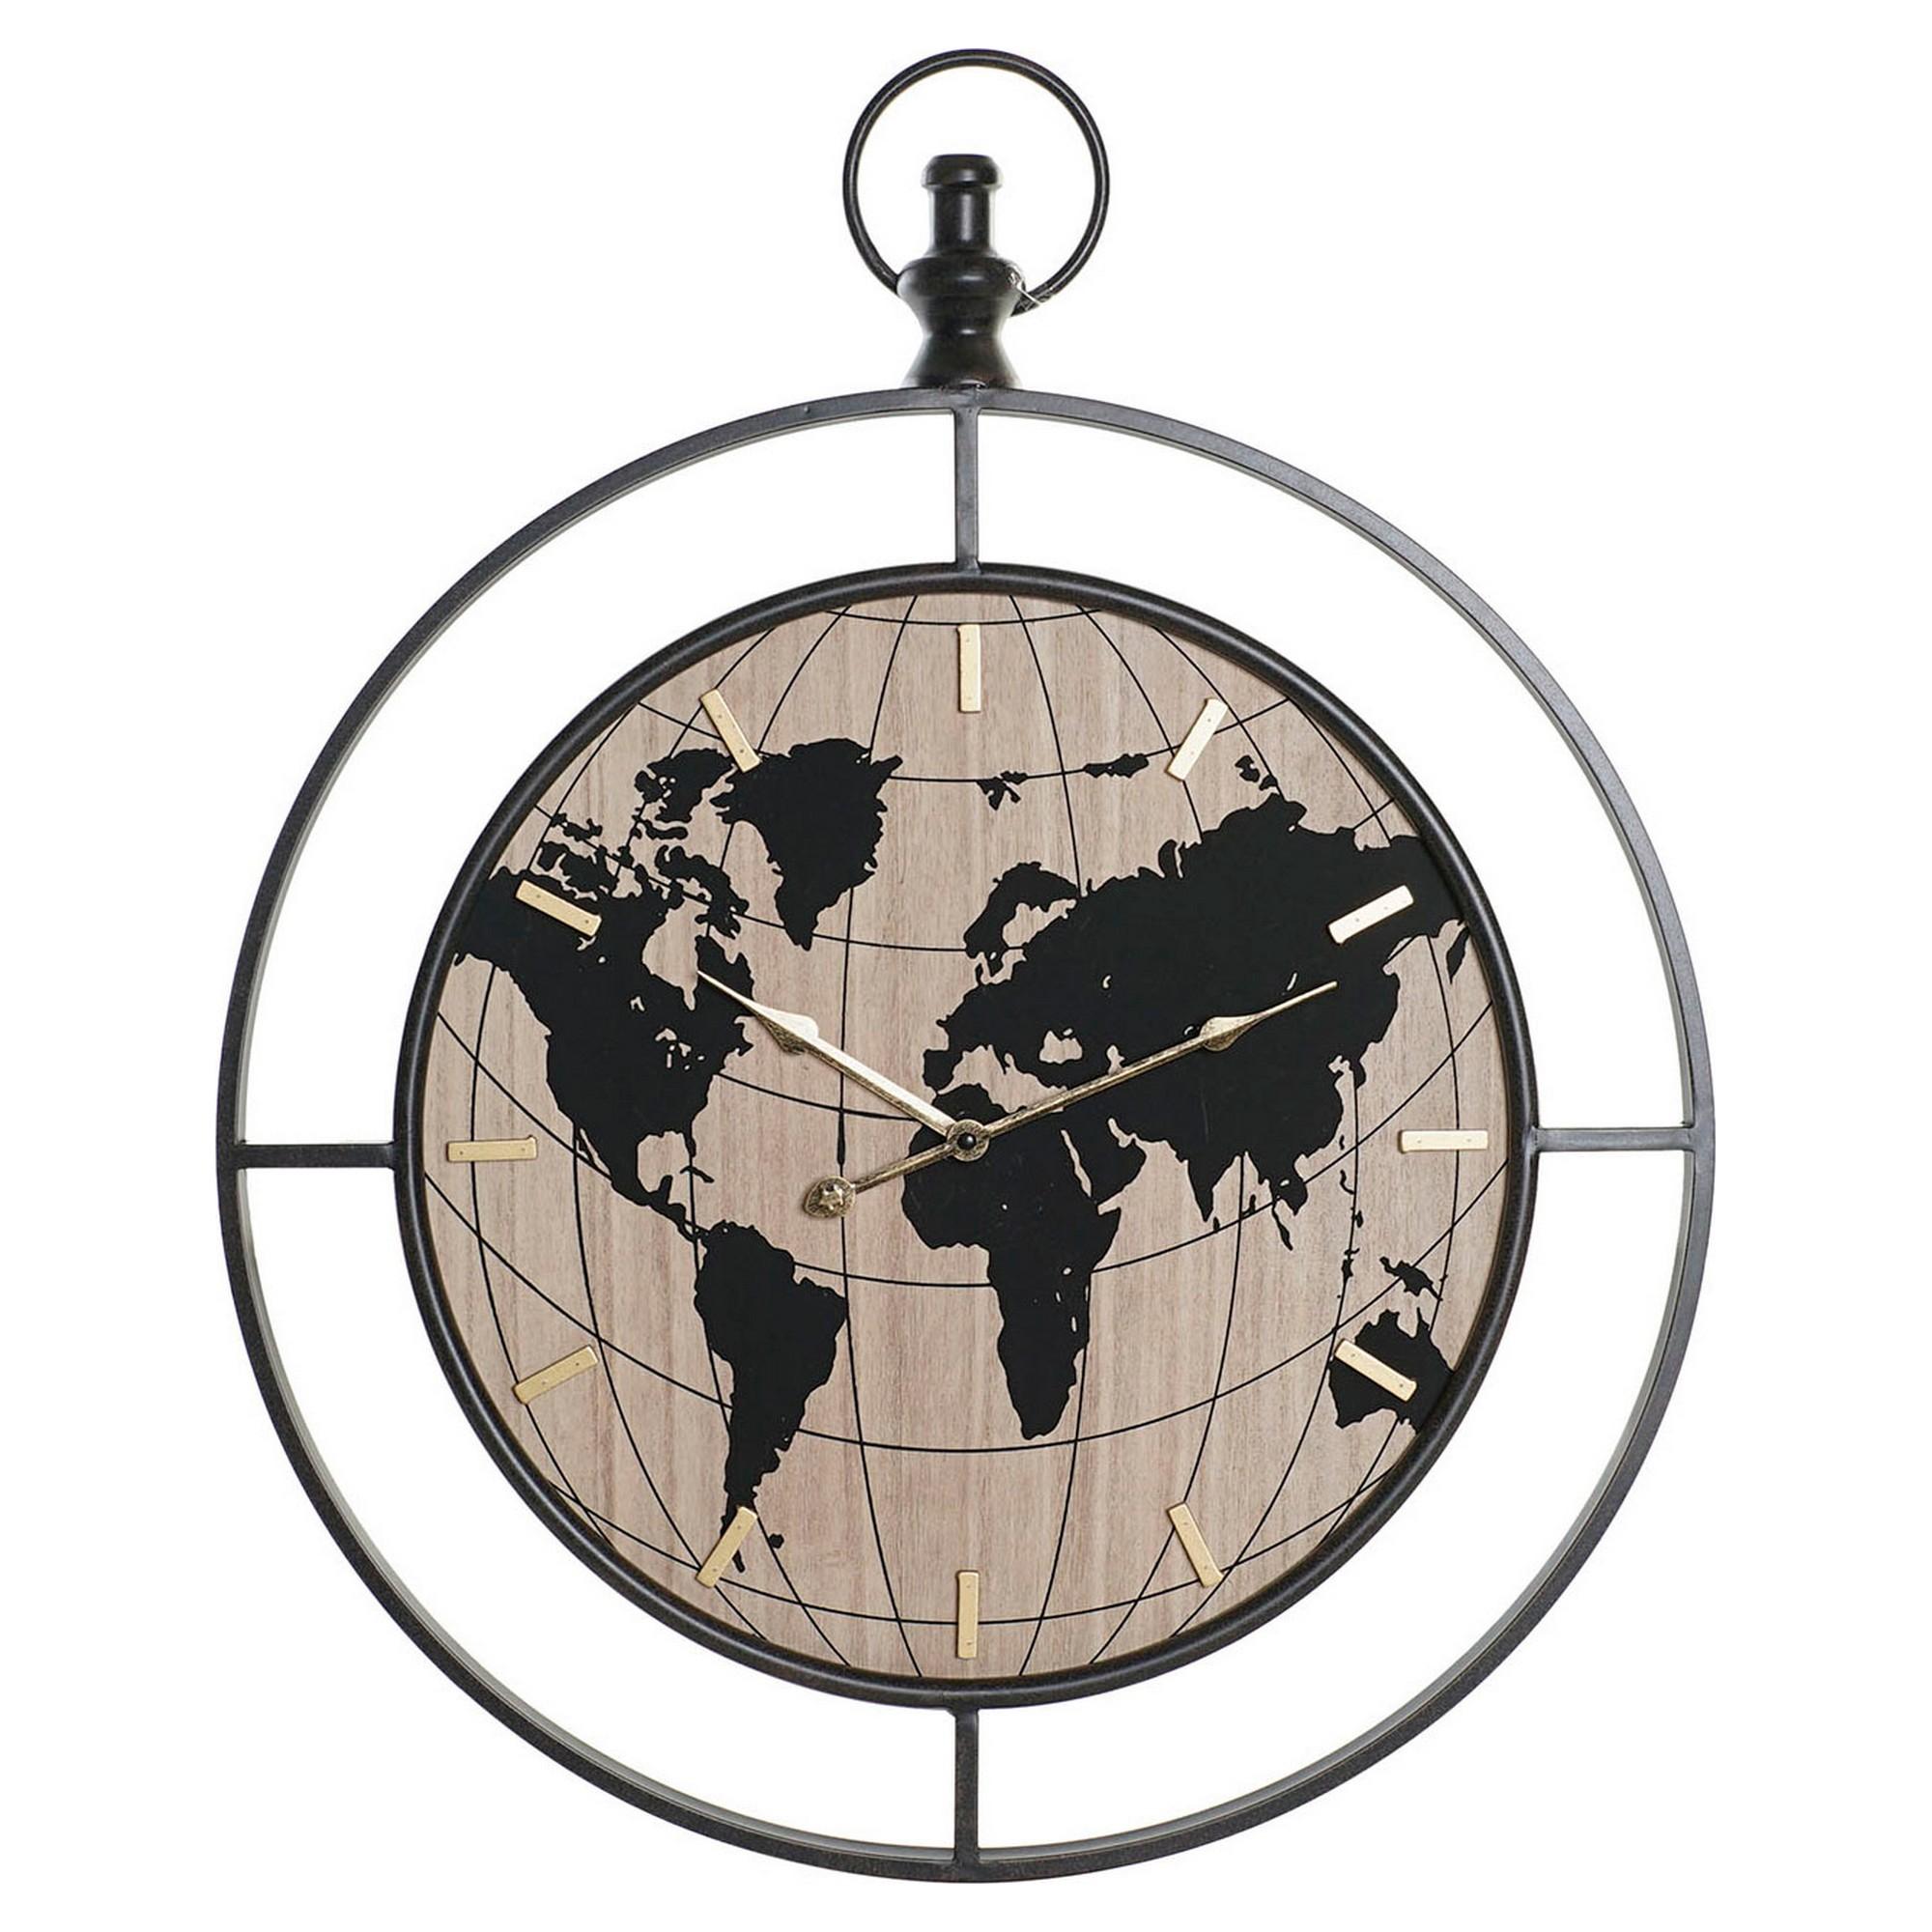 Horloge murale Erde 60x74cm Métal Noir et Bois Beige